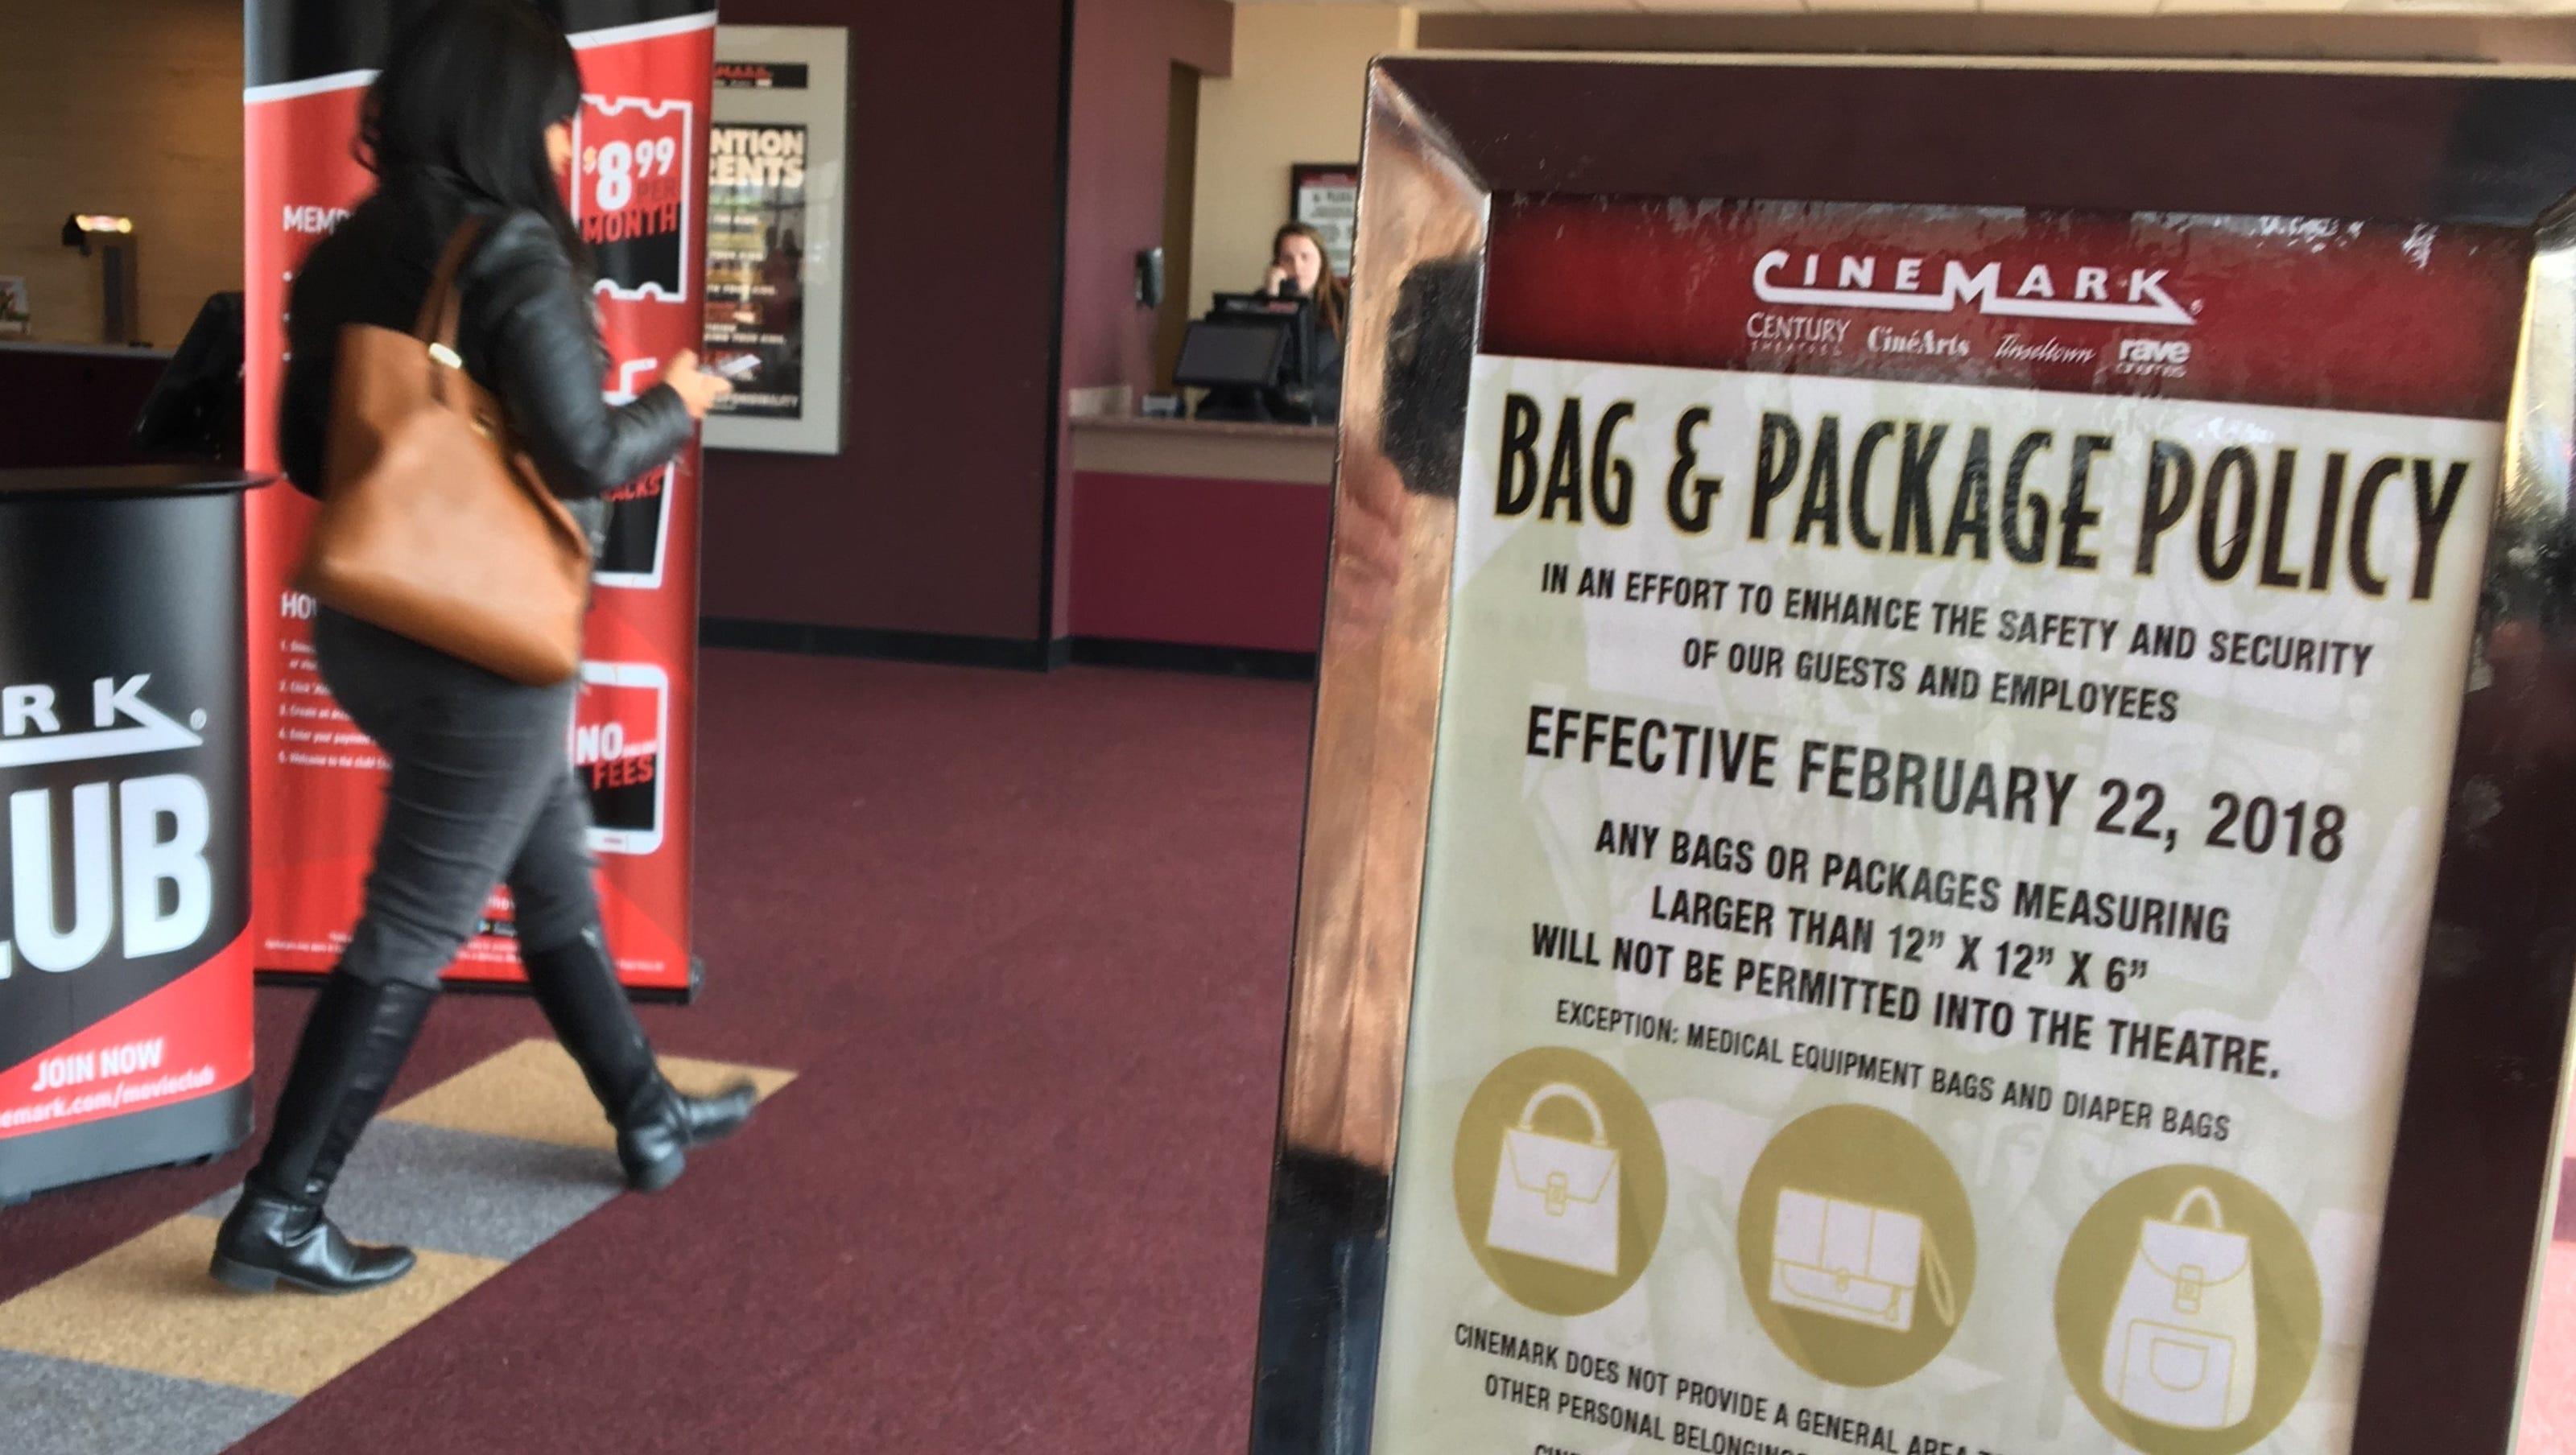 Cinemark Bans Big Handbags And Purses For Security Reasons